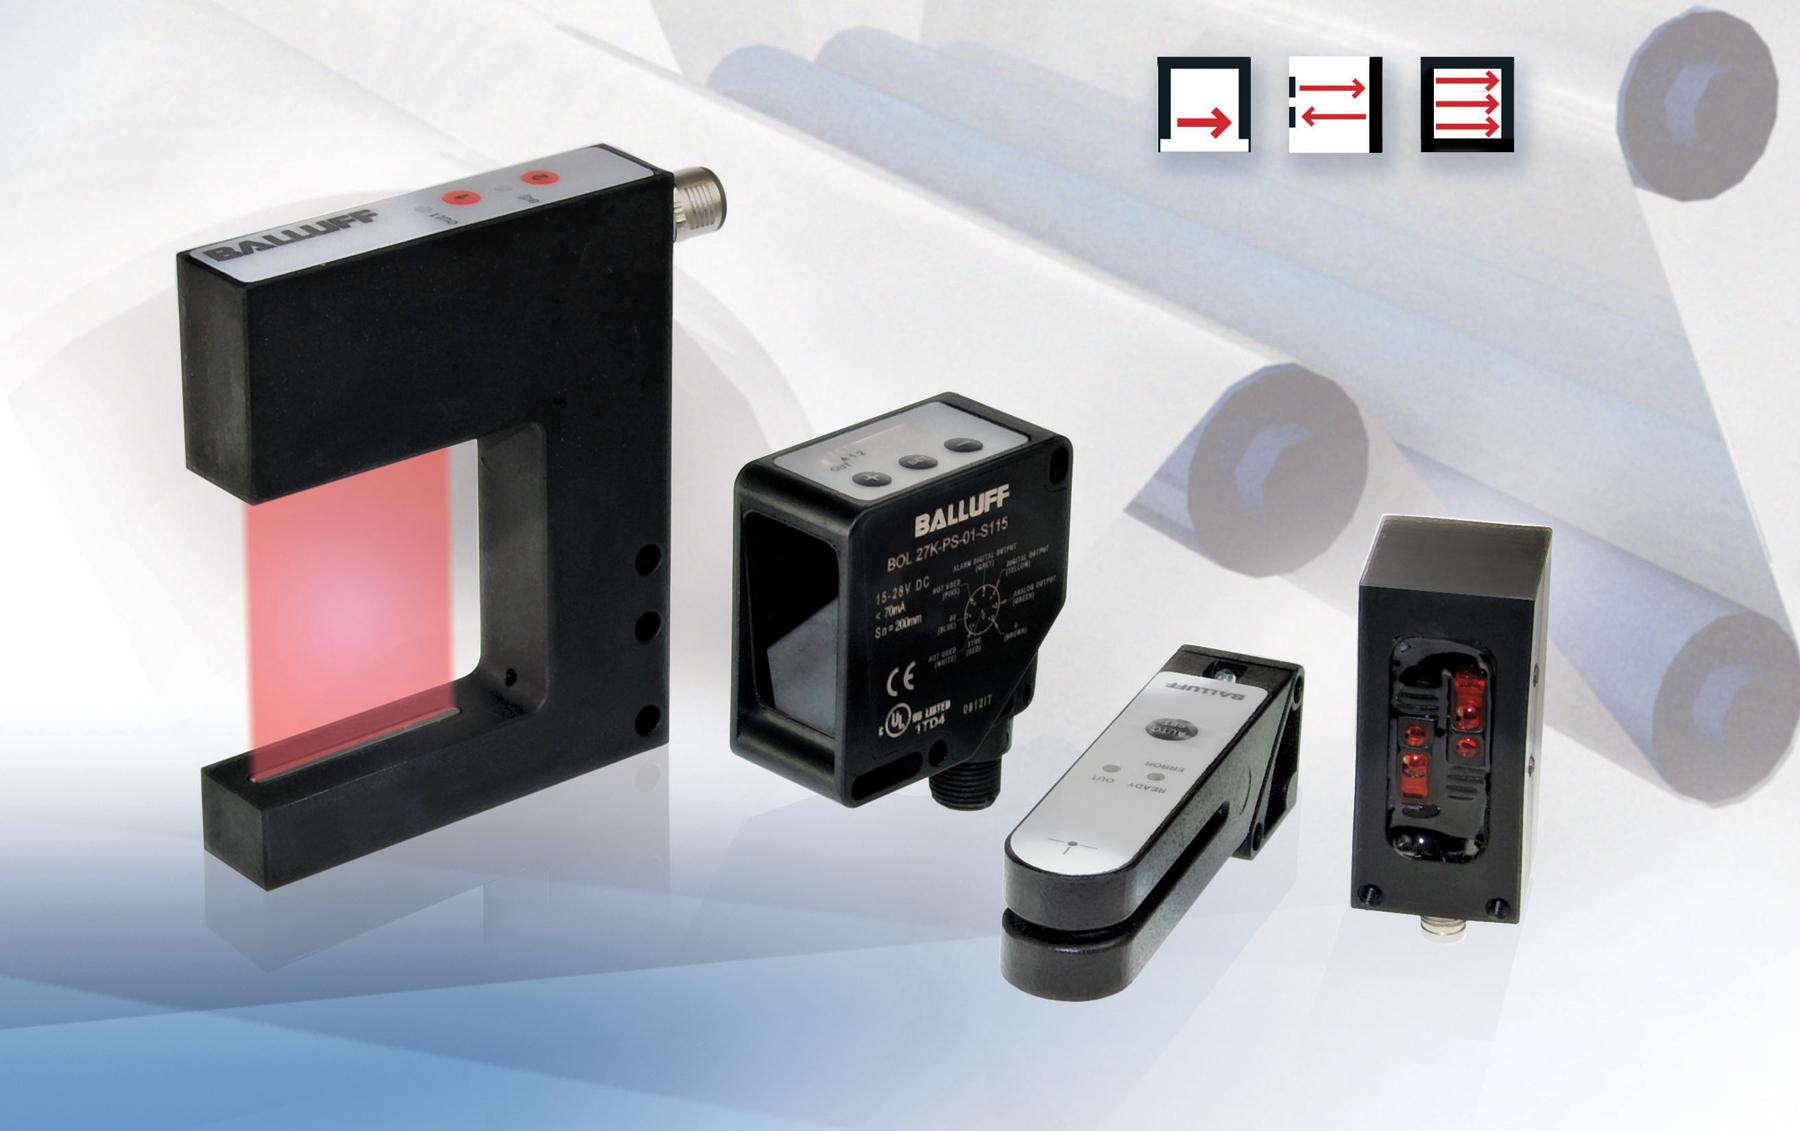 Balluff Edgemaster Sensors Accurate Web And Edge